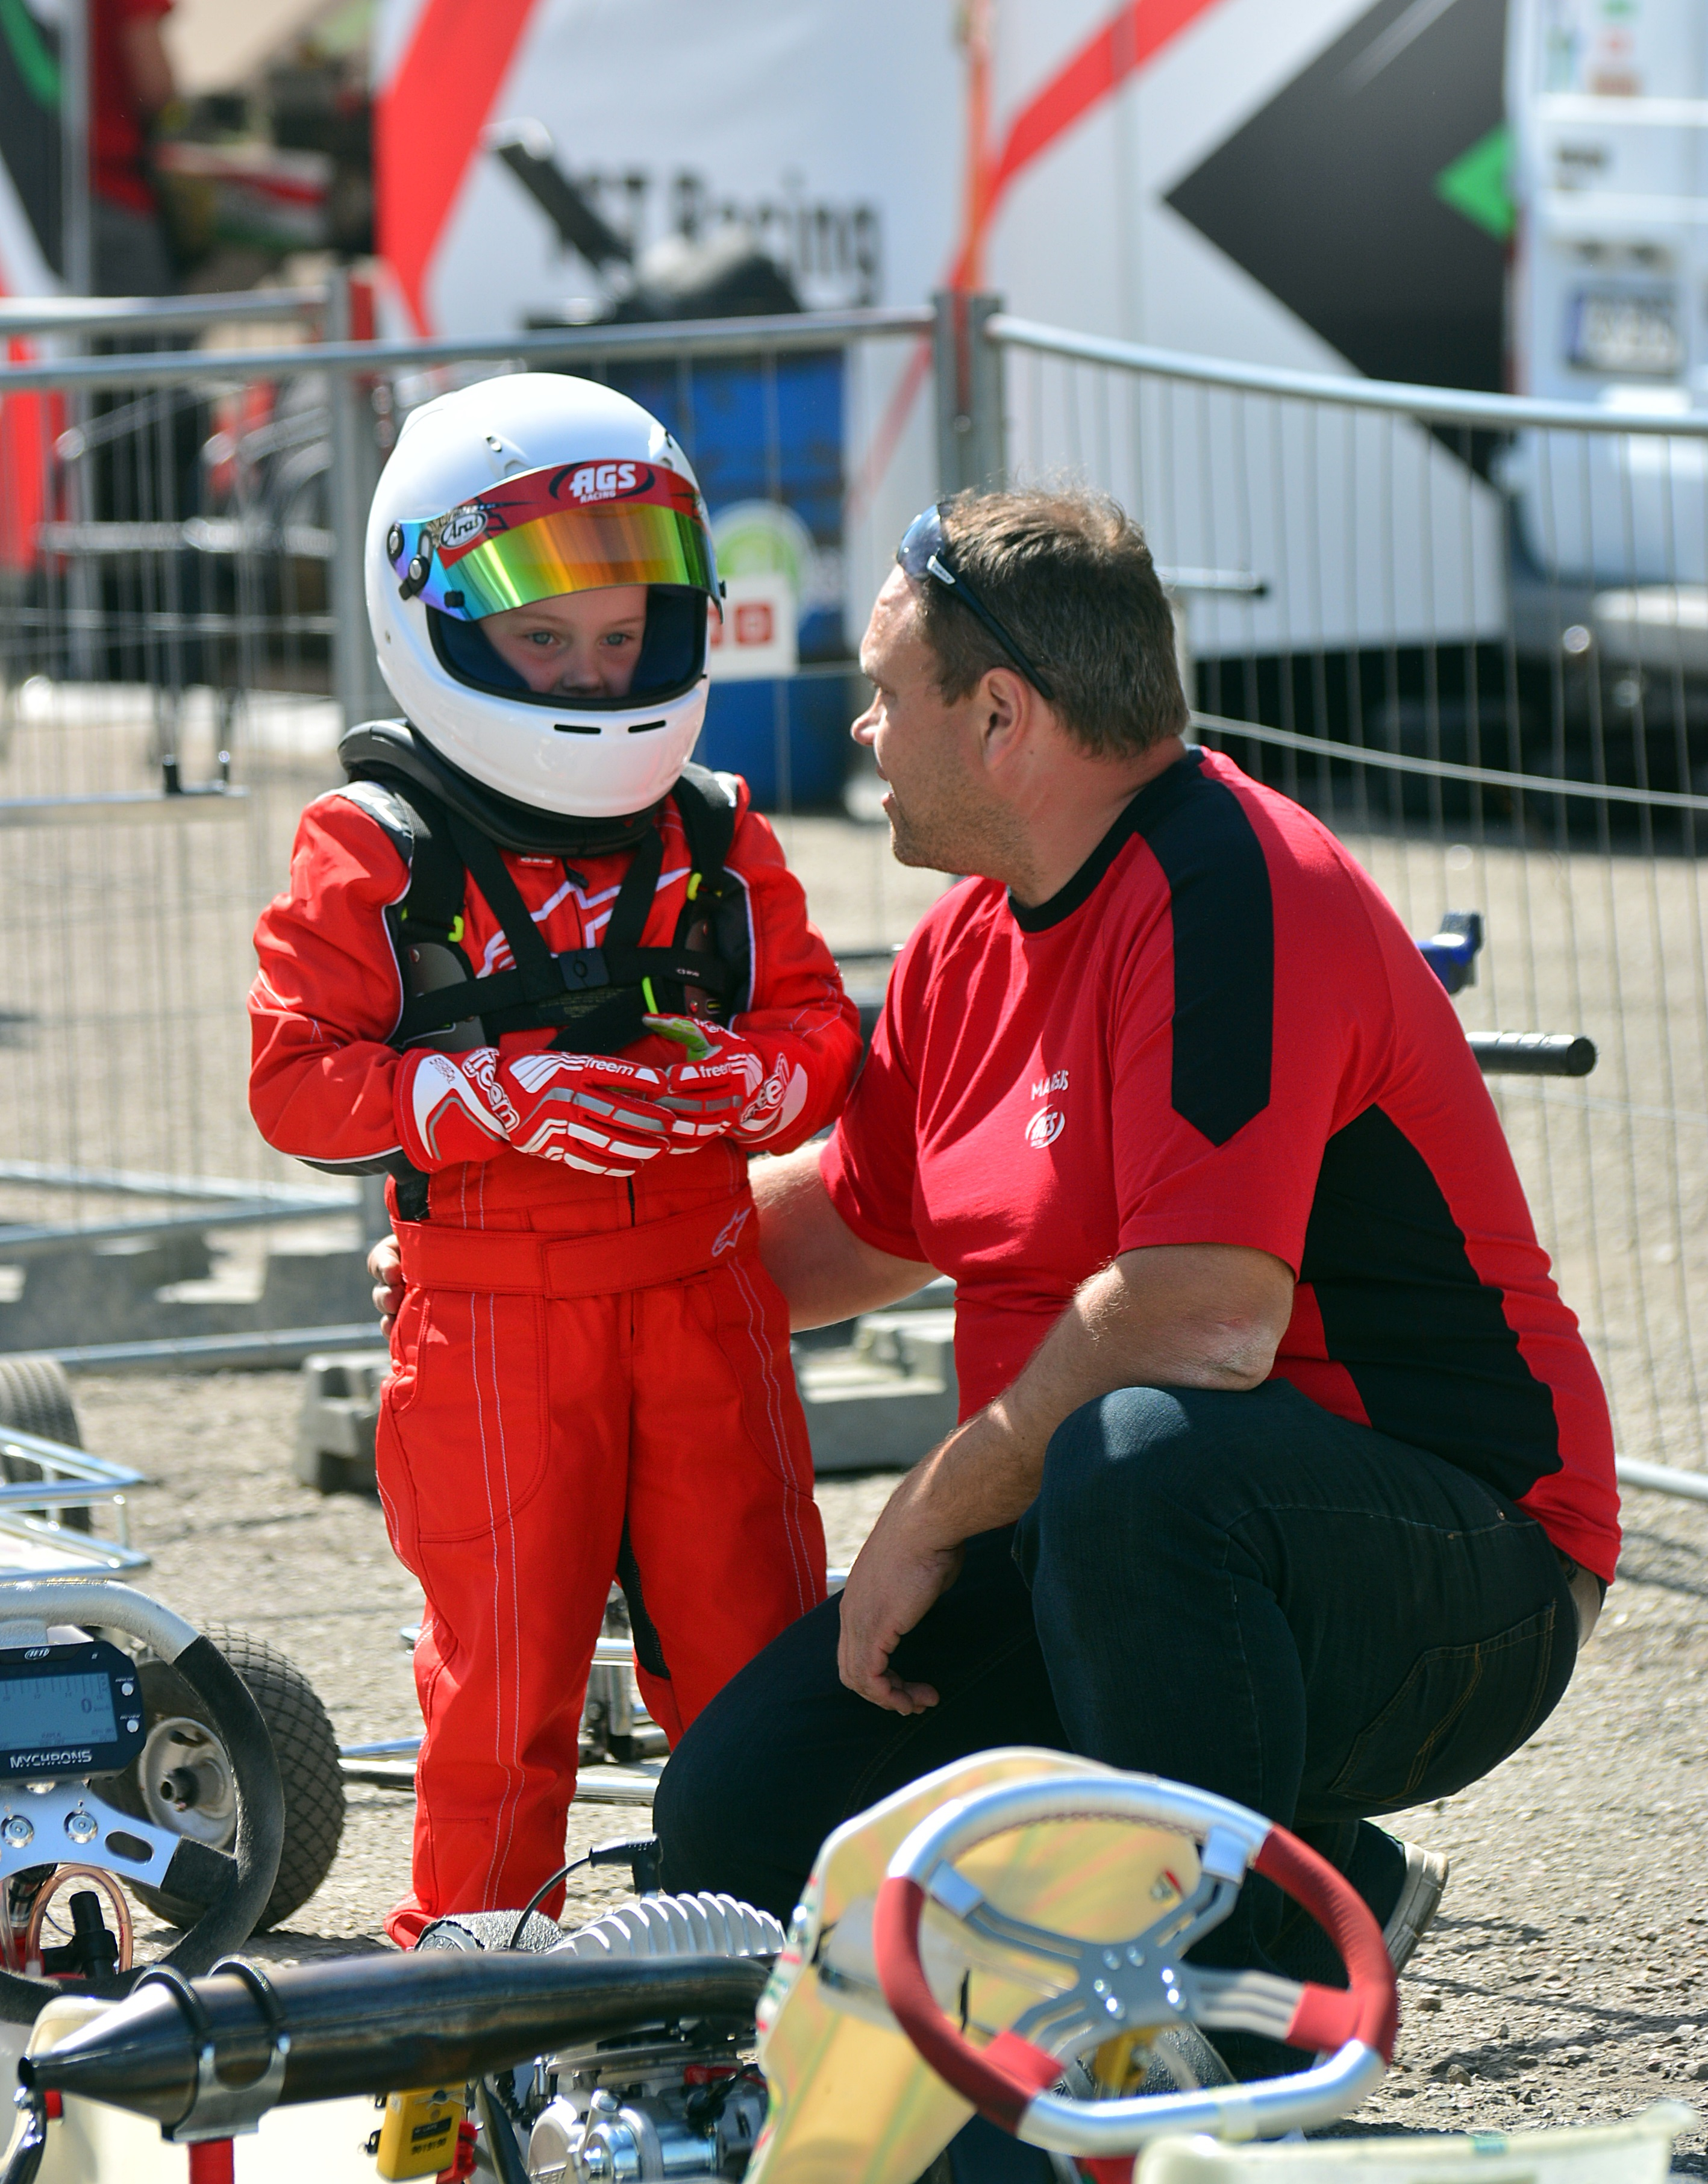 ags_racing_team_meryl